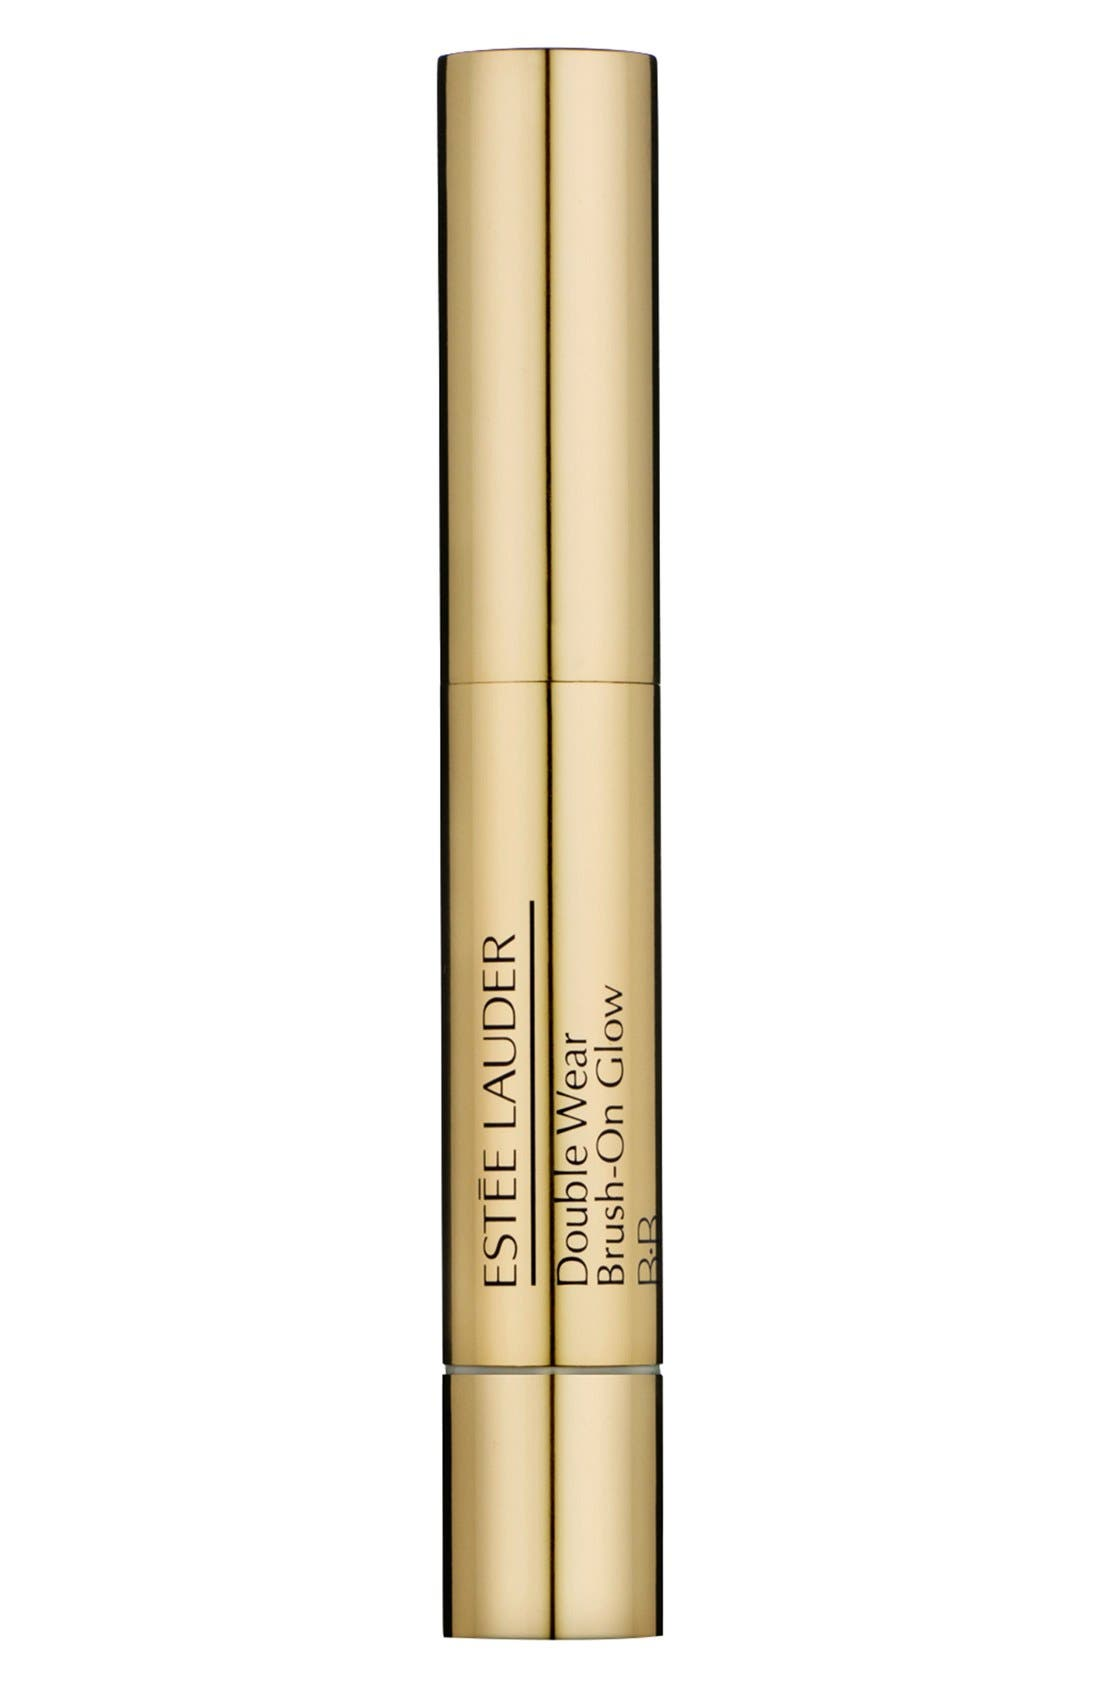 Estee Lauder Double Wear Brush-On Glow Bb Highlighter -